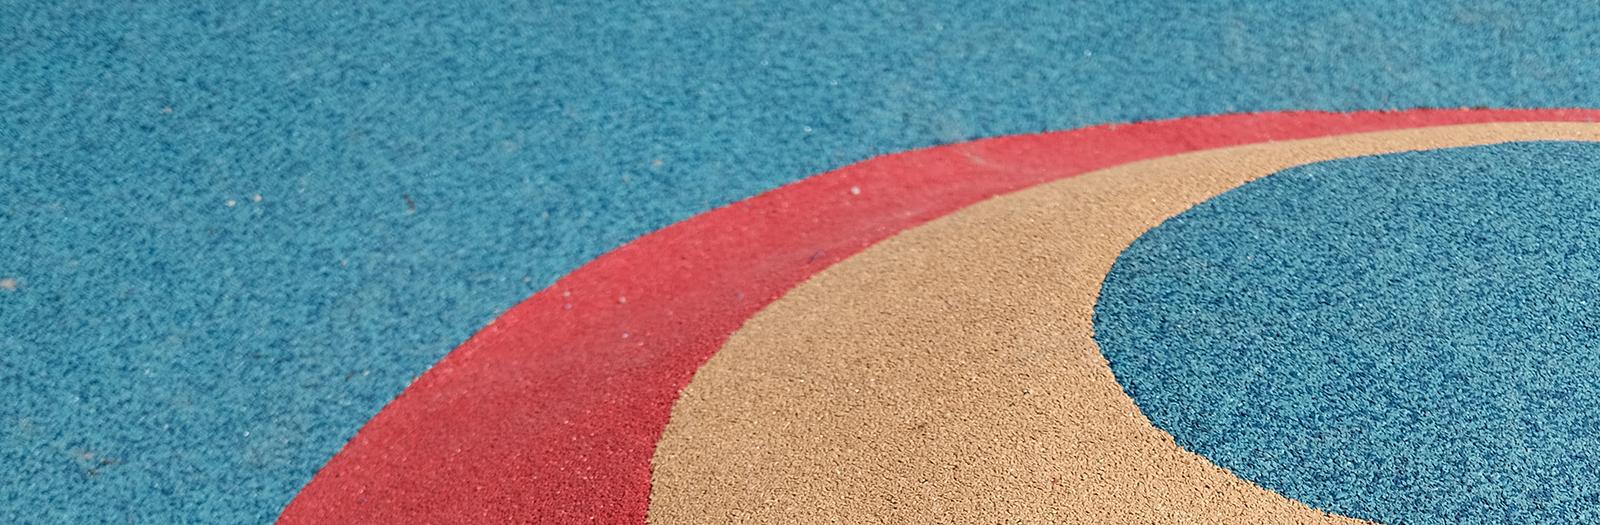 rubber playground